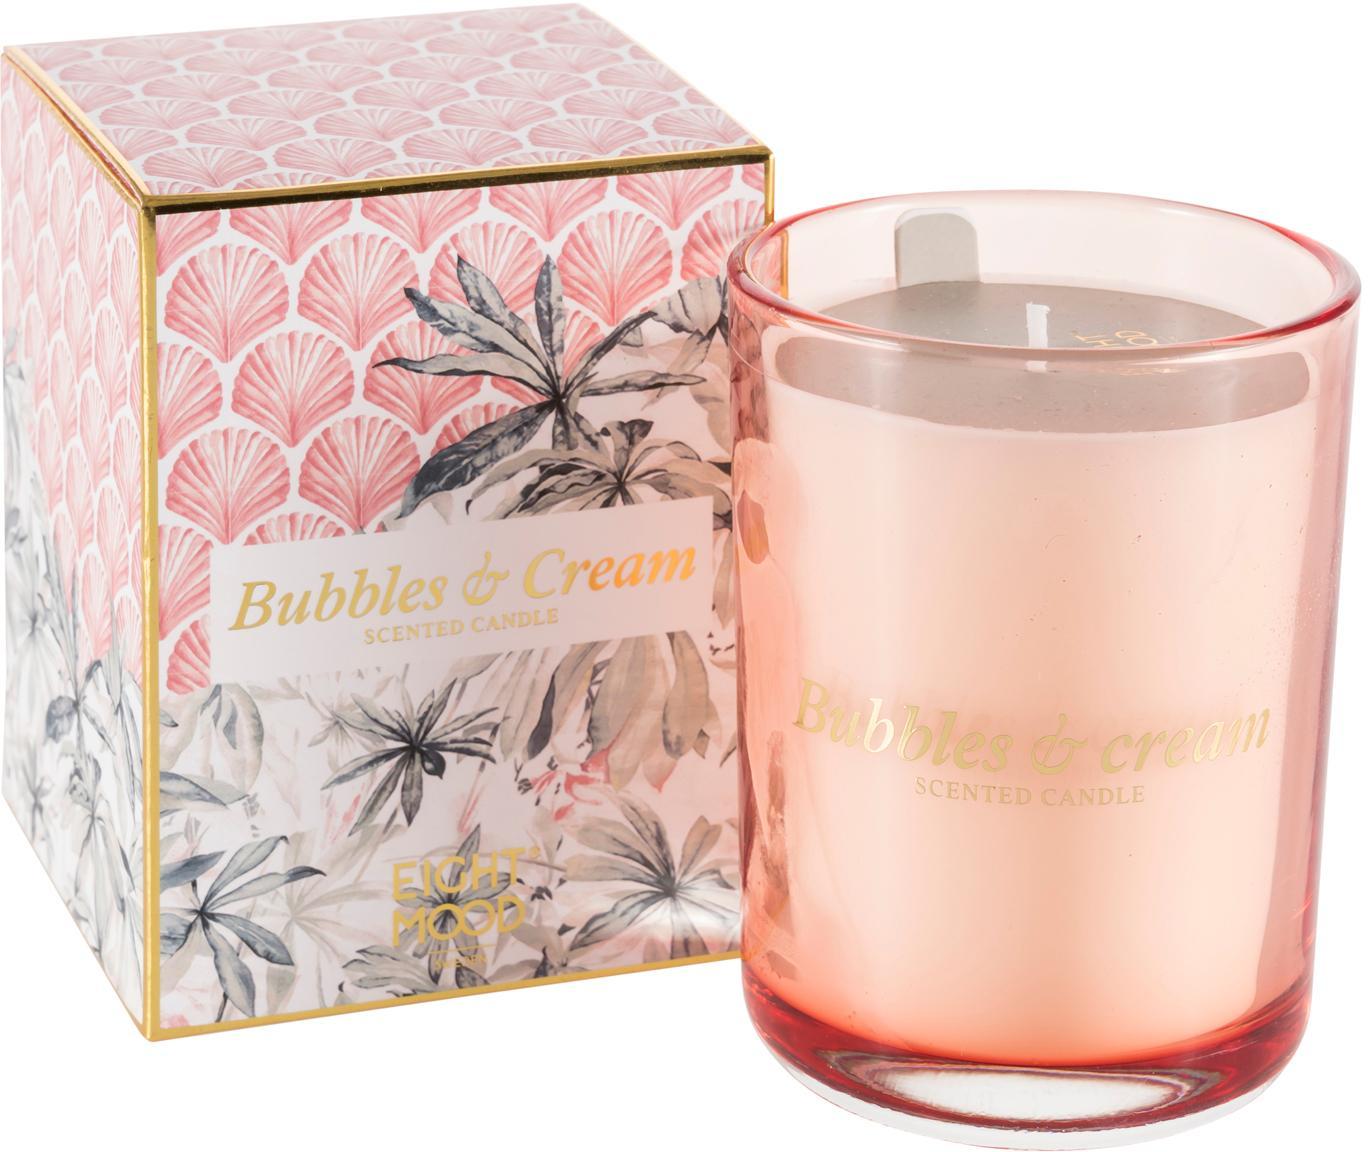 Geurkaars Allure (tuberoos, jasmijn, cederhout), Doos: papier, Houder: glas, Roze, multicolour, 9 x 12 cm